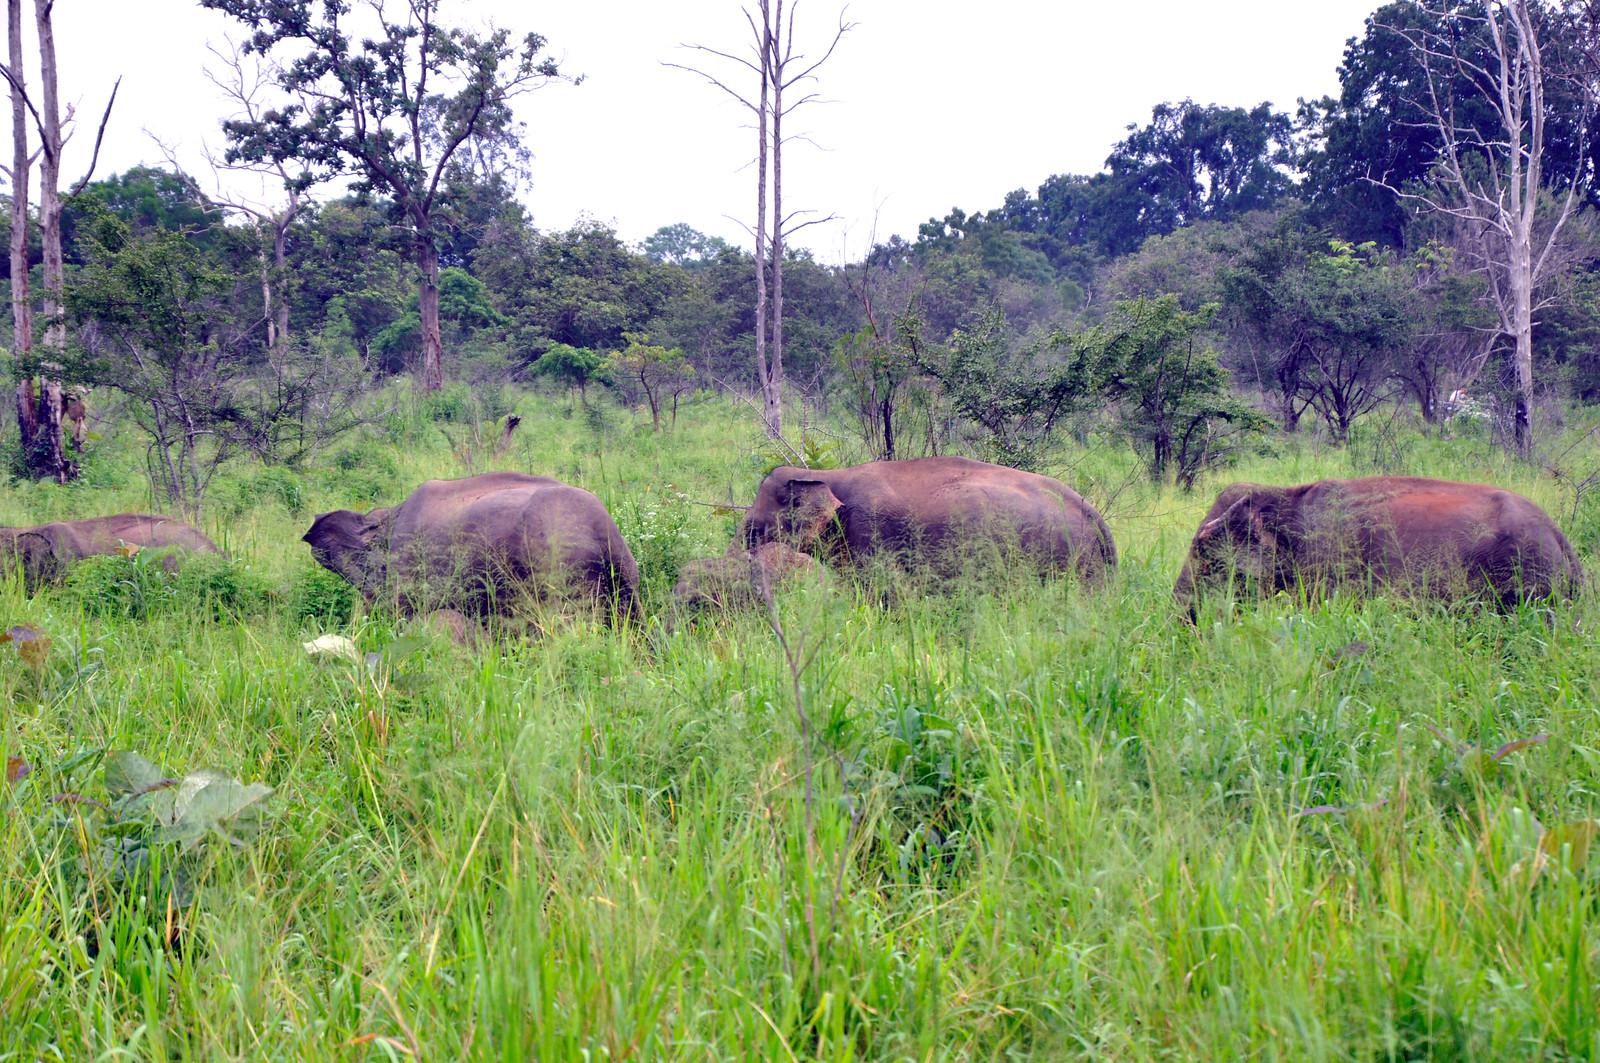 VER ELEFANTES SALVAJES EN SRI LANKA ver elefantes salvajes en sri lanka - 46921997112 f2dd4404ed h - Ver elefantes salvajes en Sri Lanka